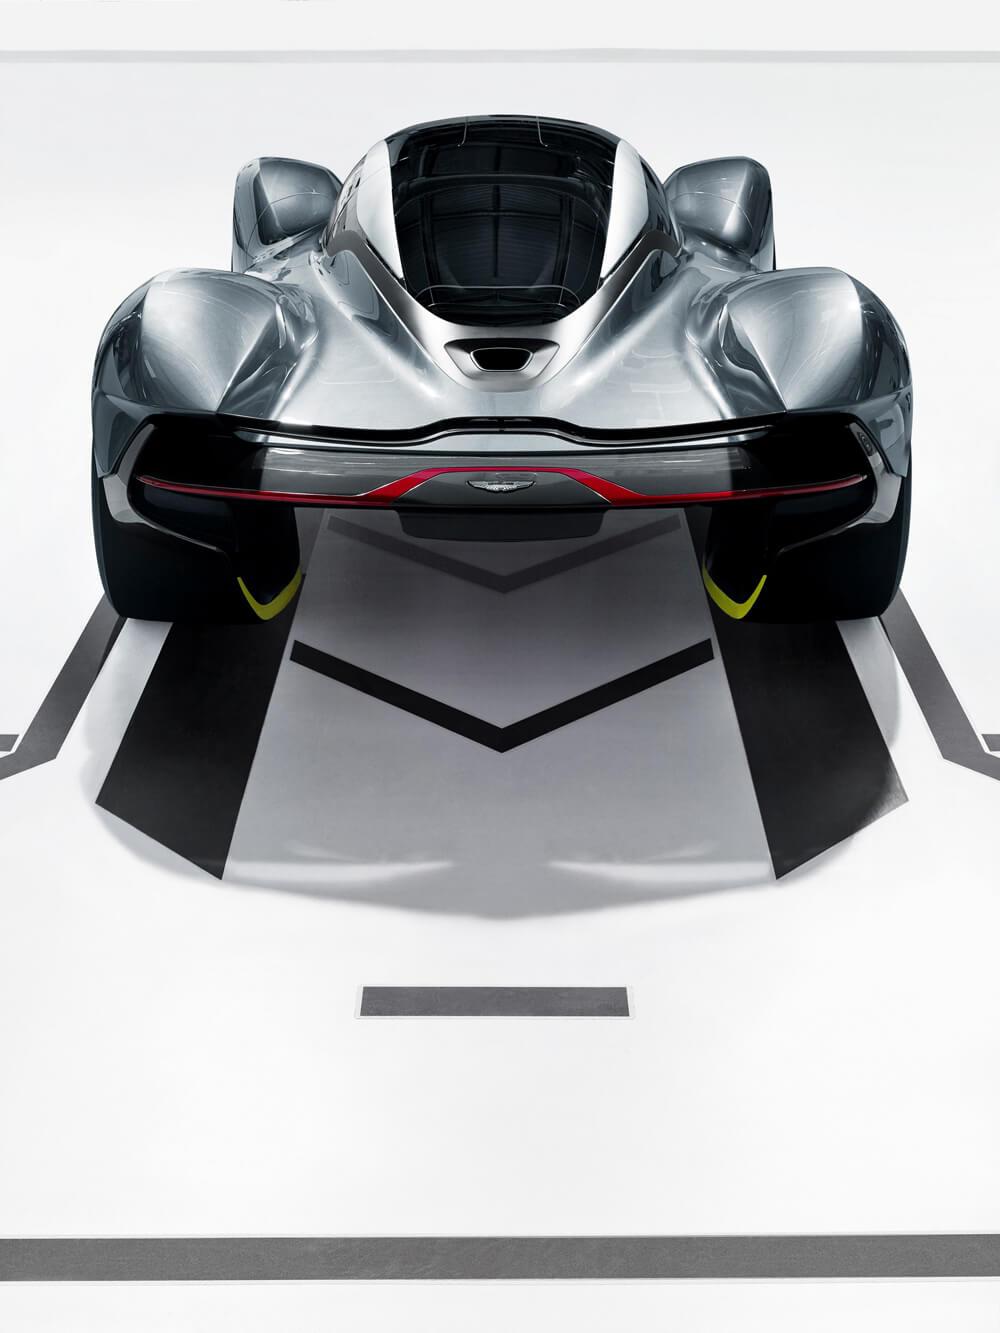 aston-martin-red-bull-racing-reveal-rb-001-hypercar-2